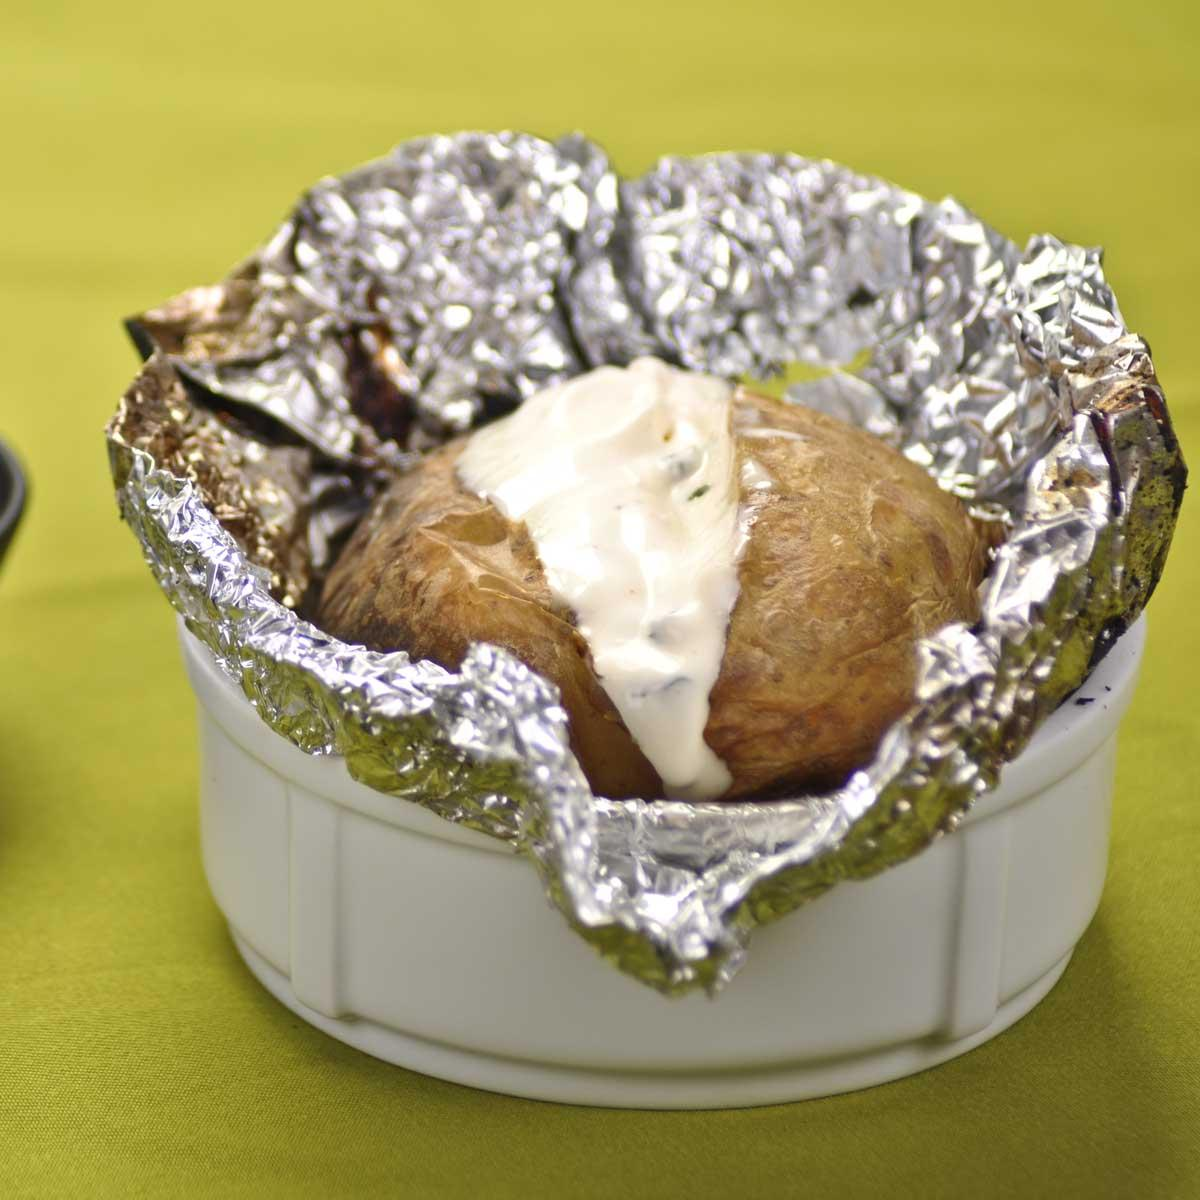 recette pommes de terre au four cuisine madame figaro. Black Bedroom Furniture Sets. Home Design Ideas